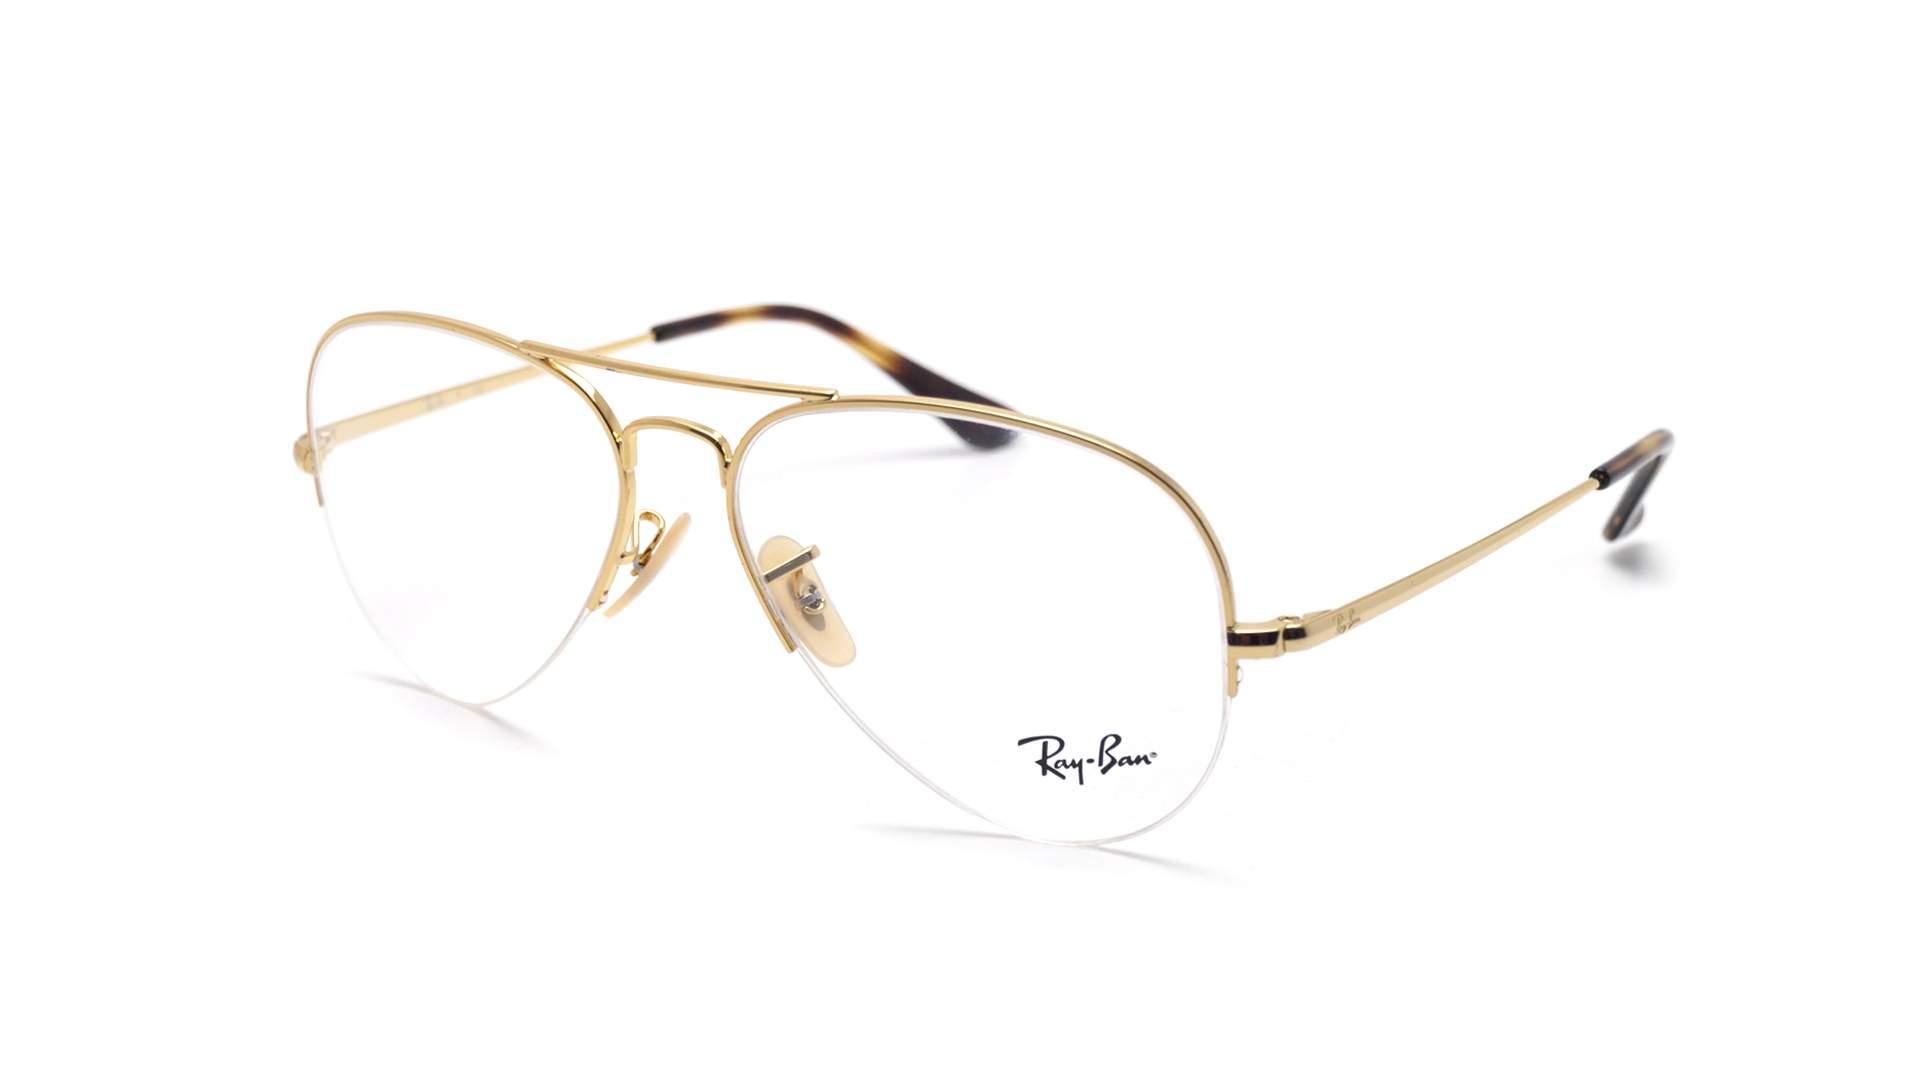 c481c72db Eyeglasses Ray-Ban Aviator Gaze Gold RX6589 RB6589 2500 59-15 Large